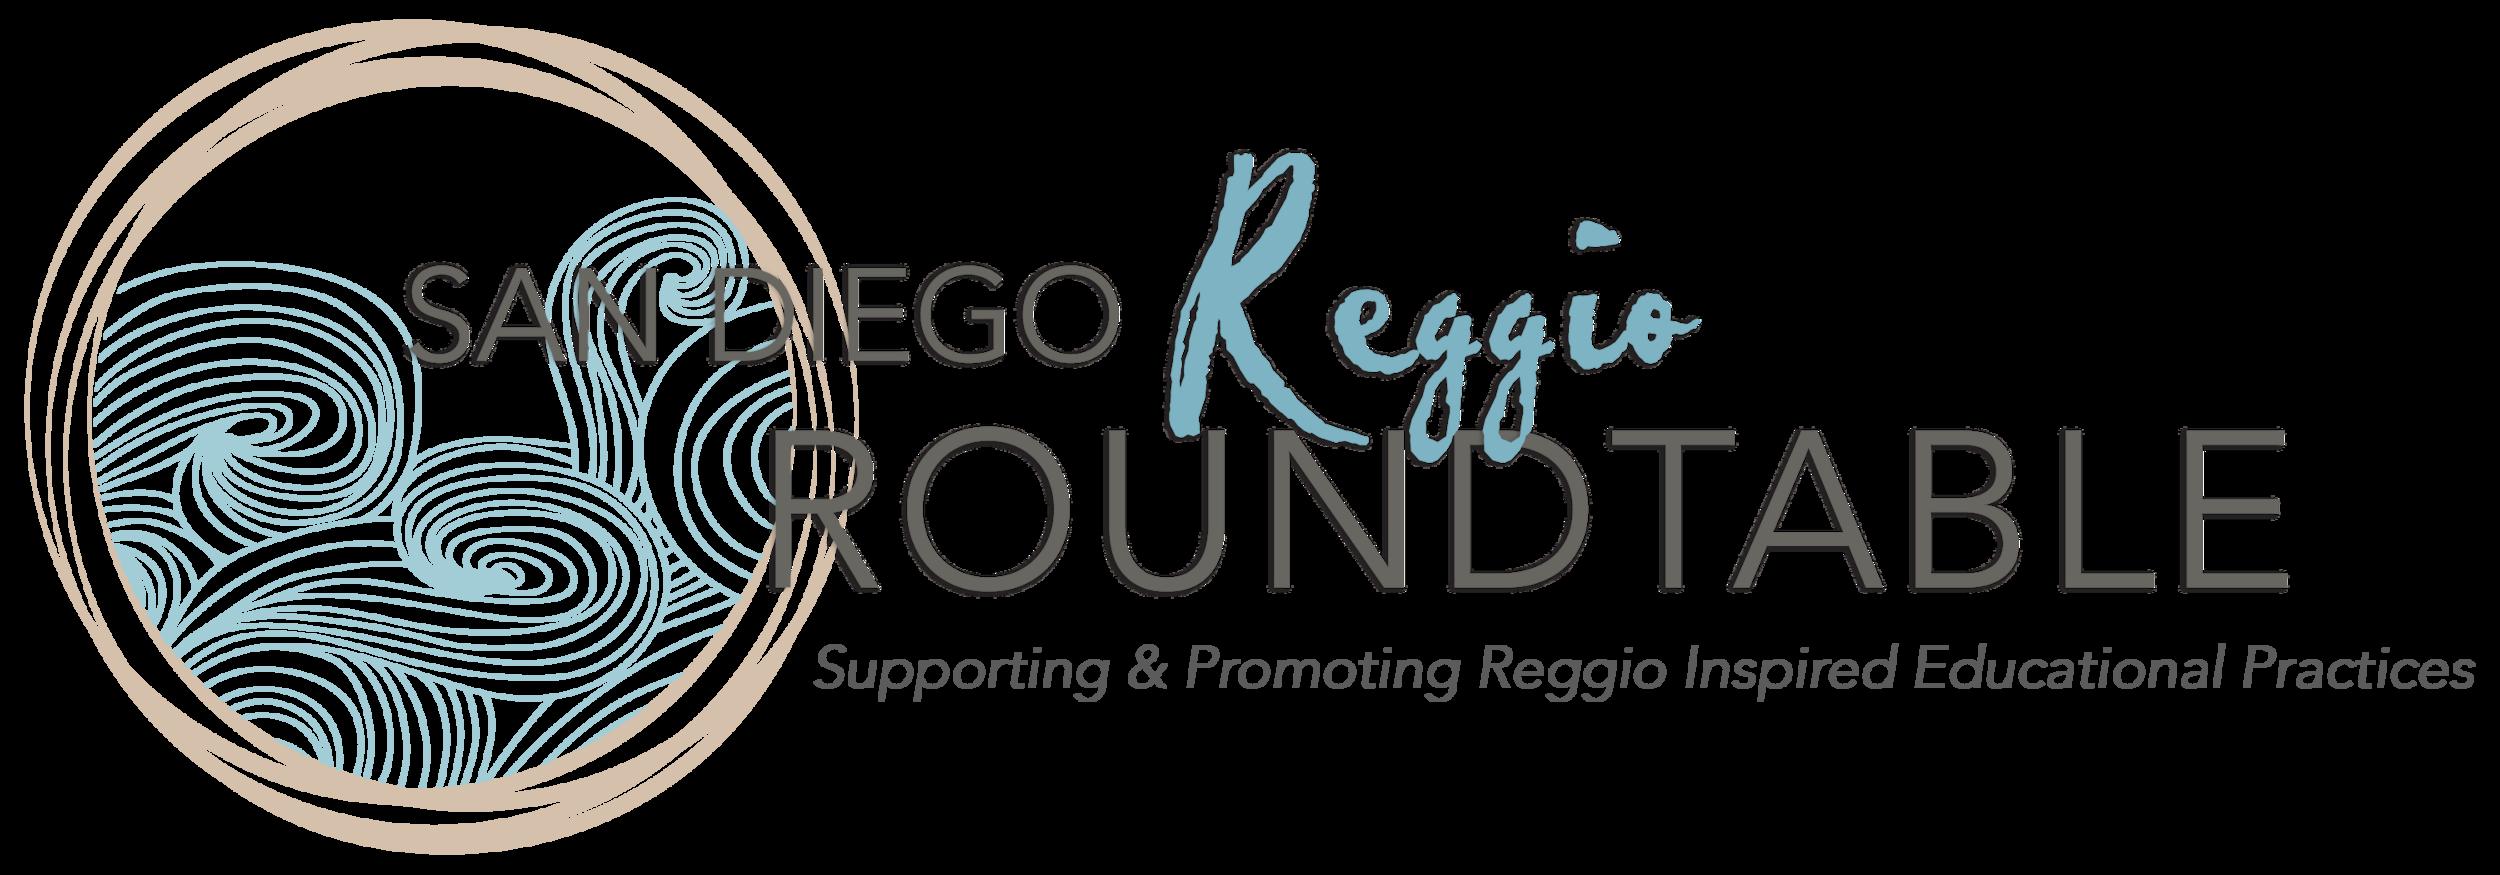 SDRR_Logo_Web-012.png